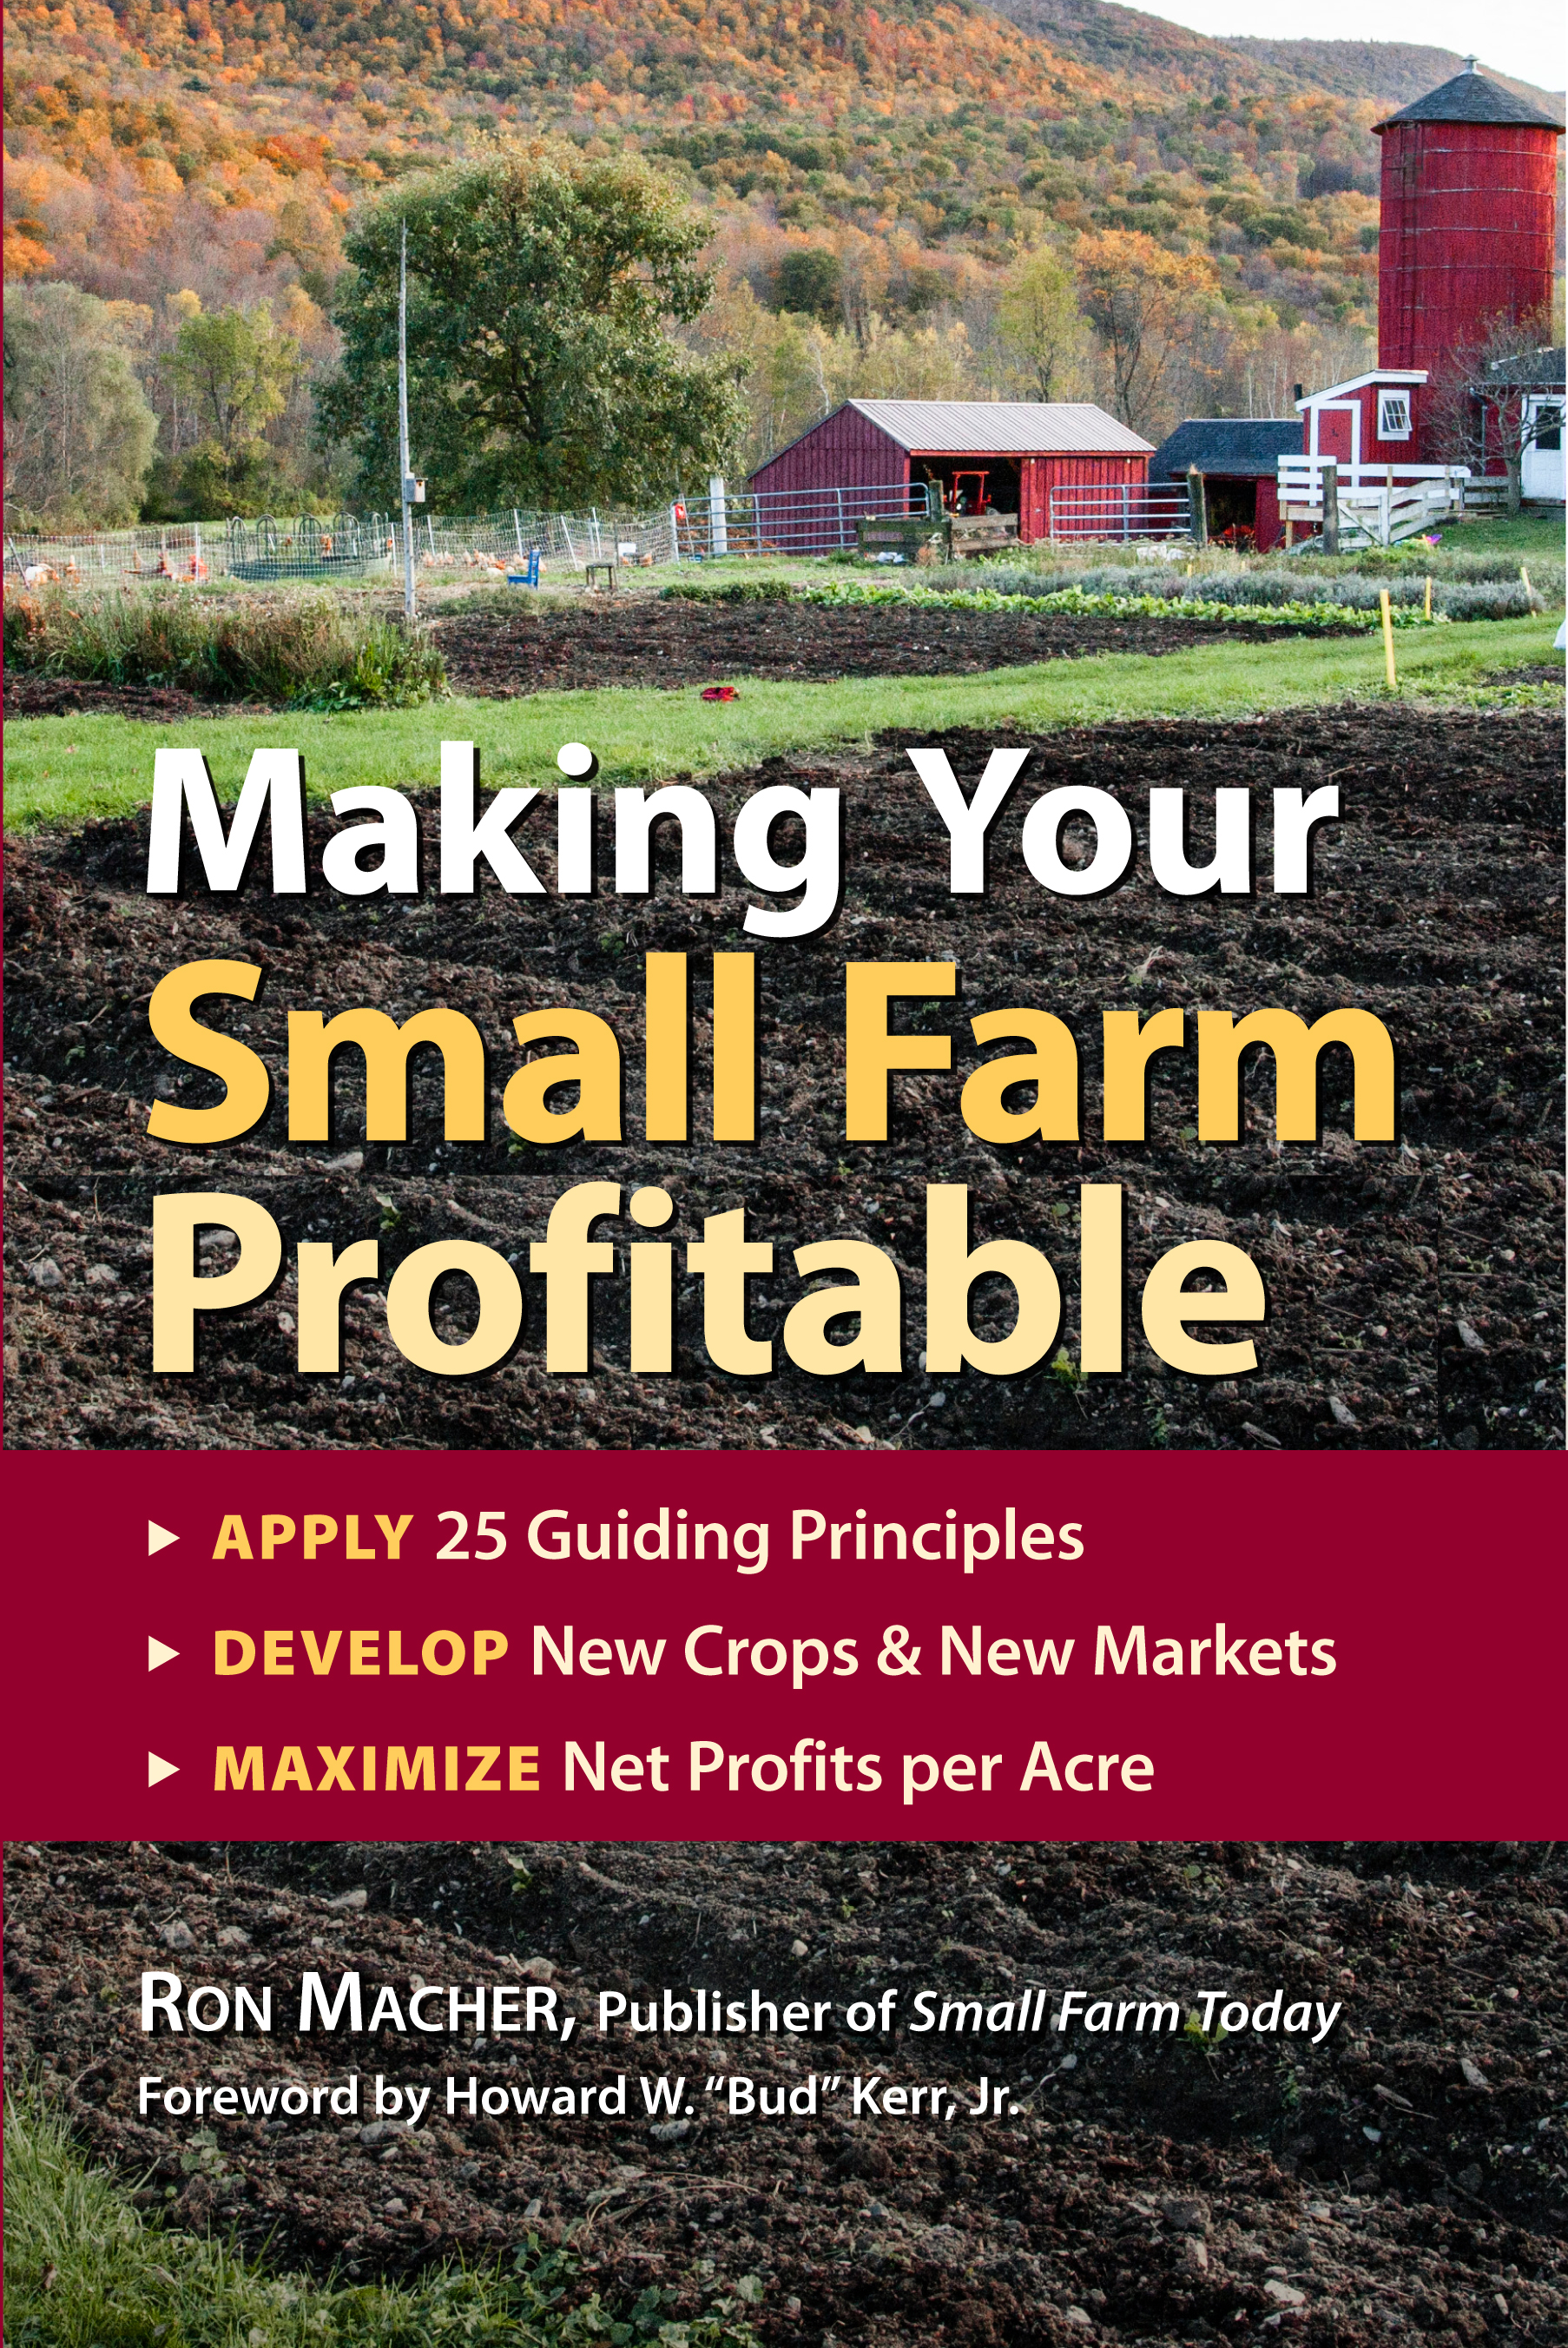 Making Your Small Farm Profitable Apply 25 Guiding Principles/Develop New Crops & New Markets/Maximize Net Profits Per Acre - Ron Macher